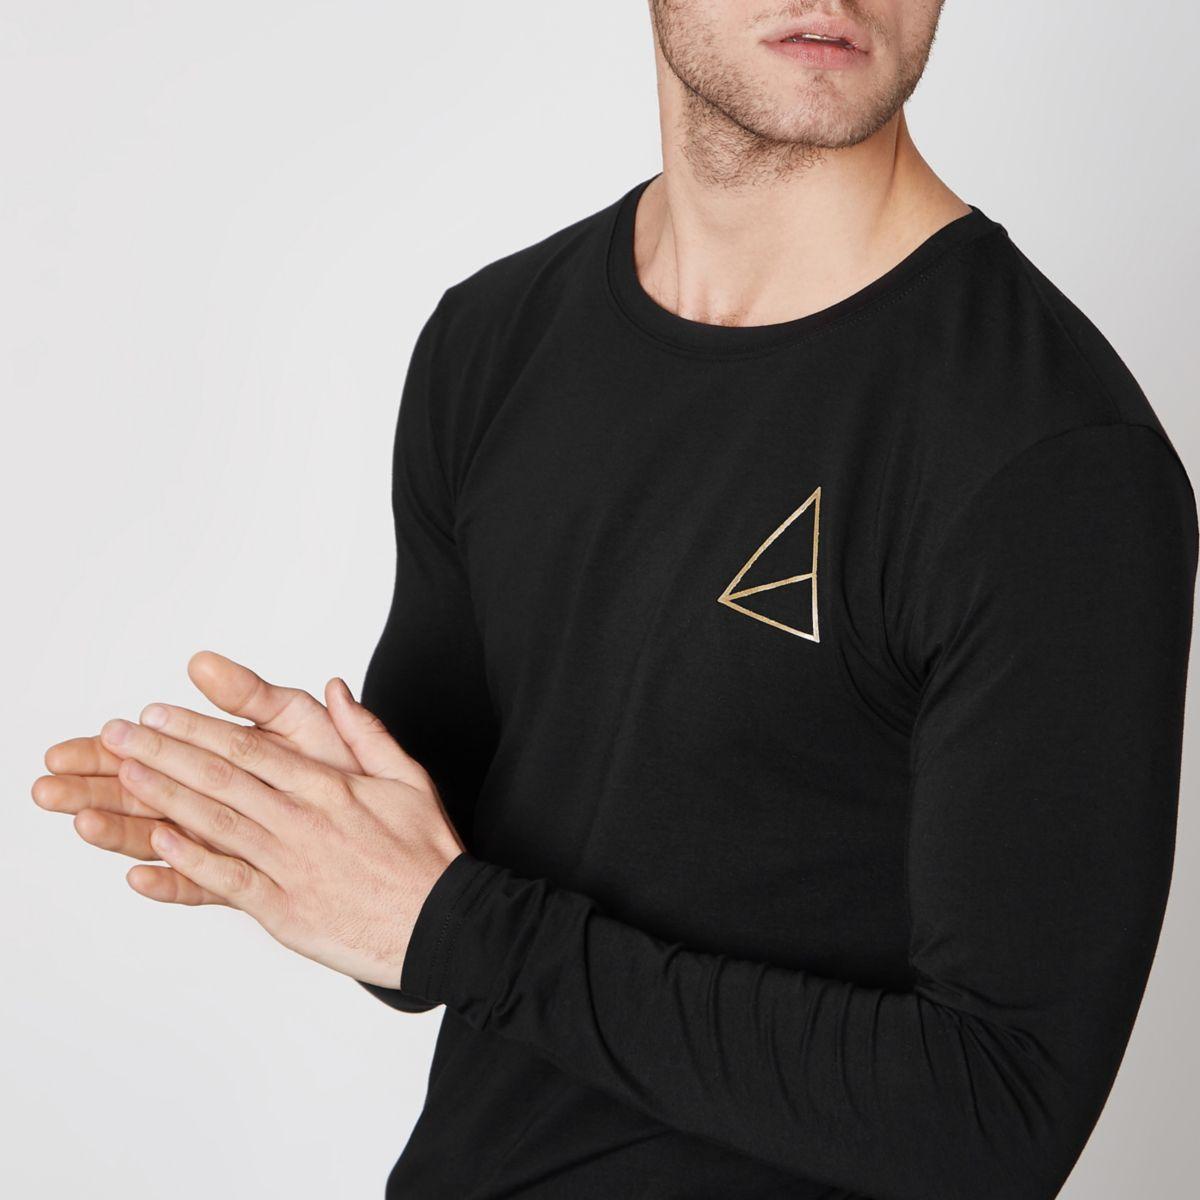 Golden Equation black long sleeve T-shirt